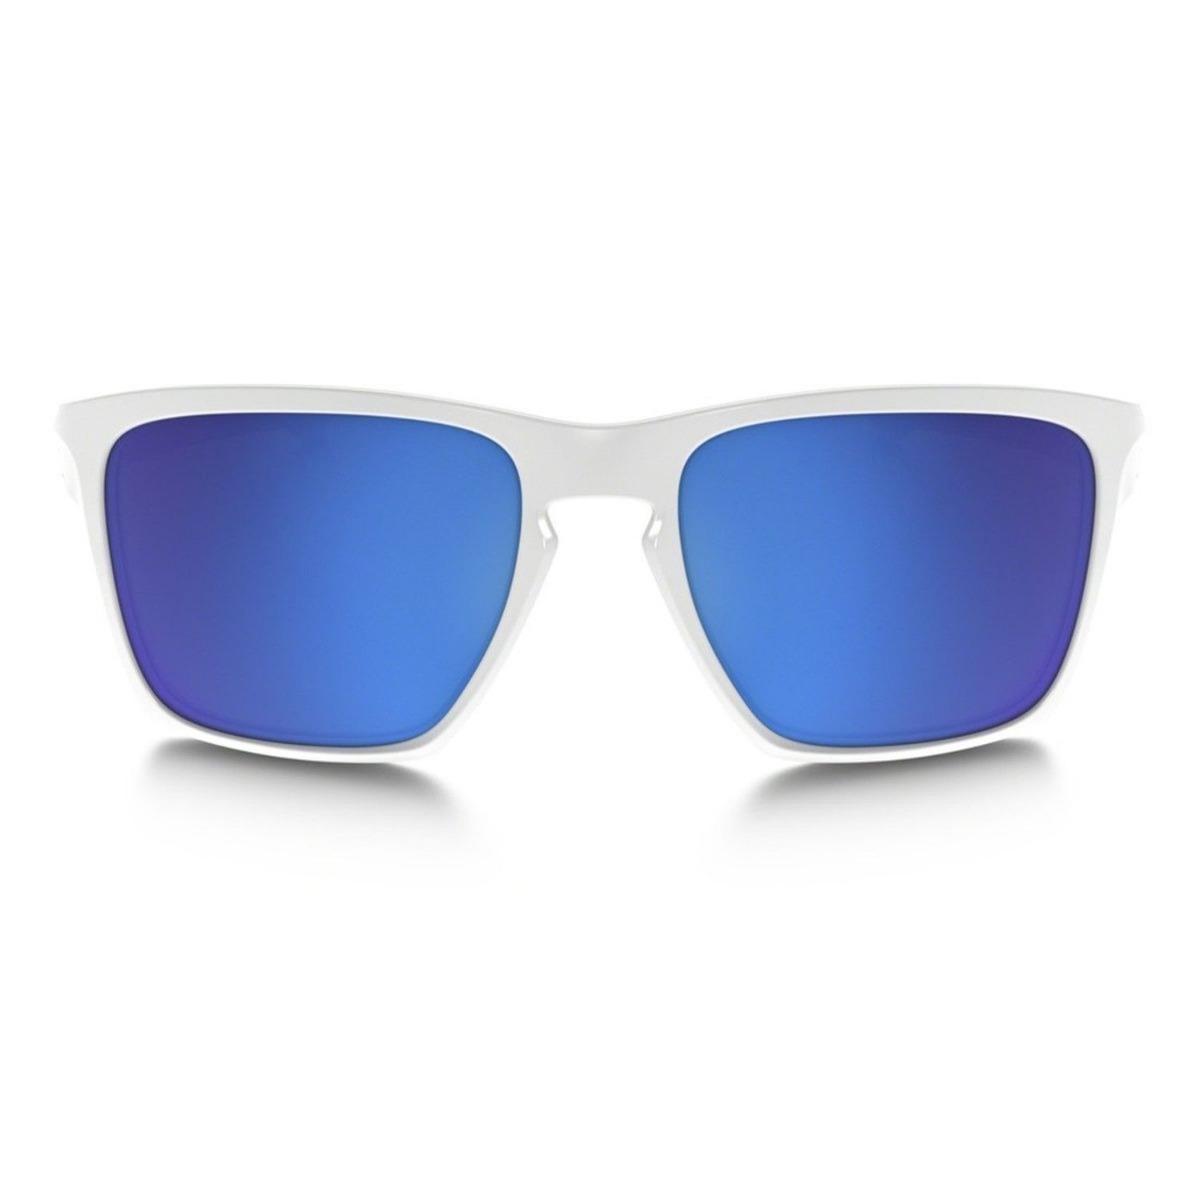 468eb28ee Òculos Oakley Sliver Xl White/sapphire Iridium * U S A * - R$ 499,99 ...